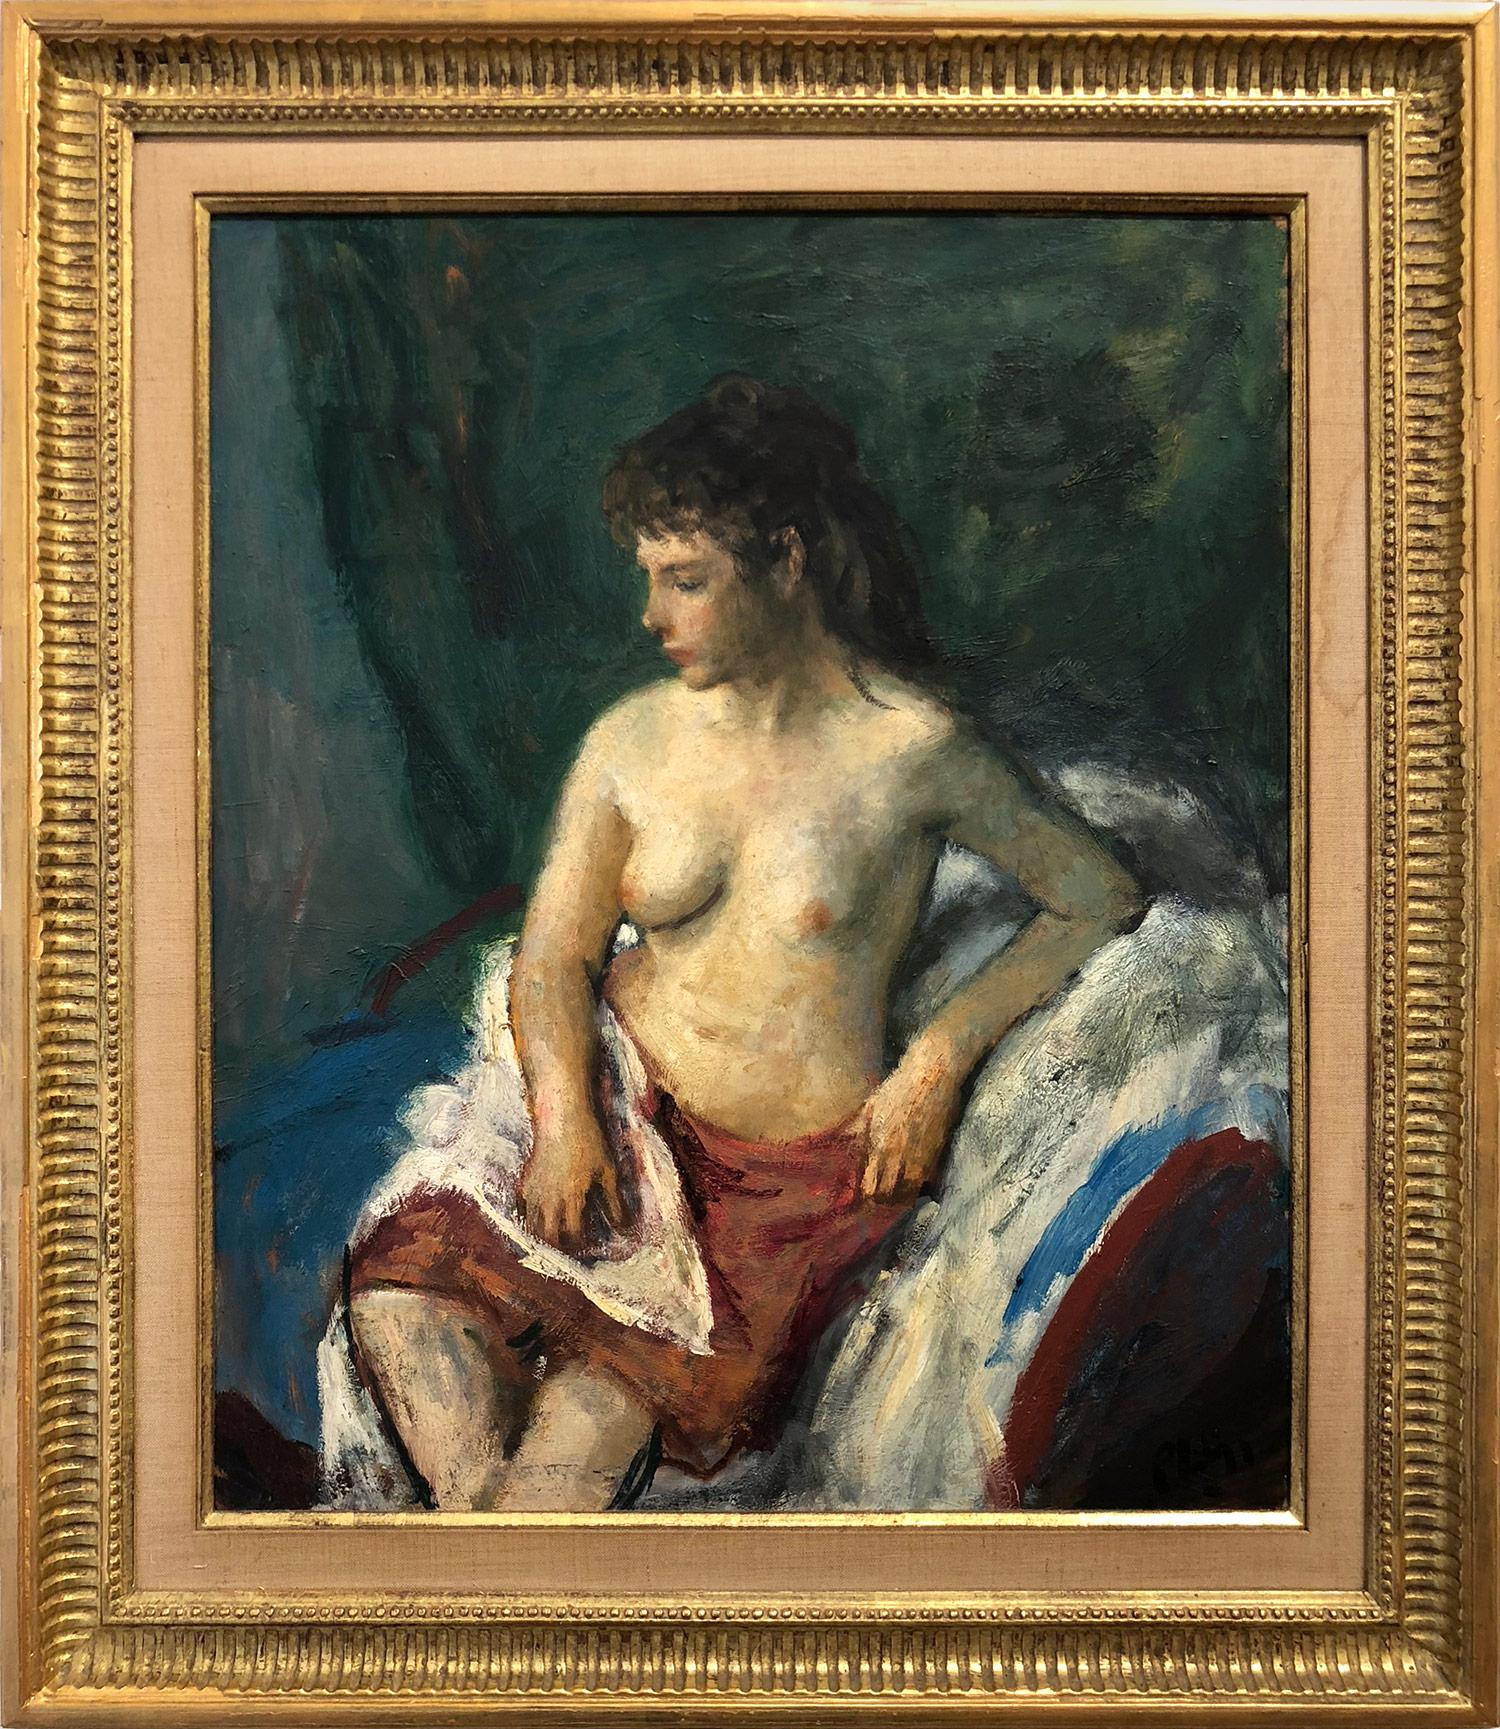 Portrait of a Nude Woman